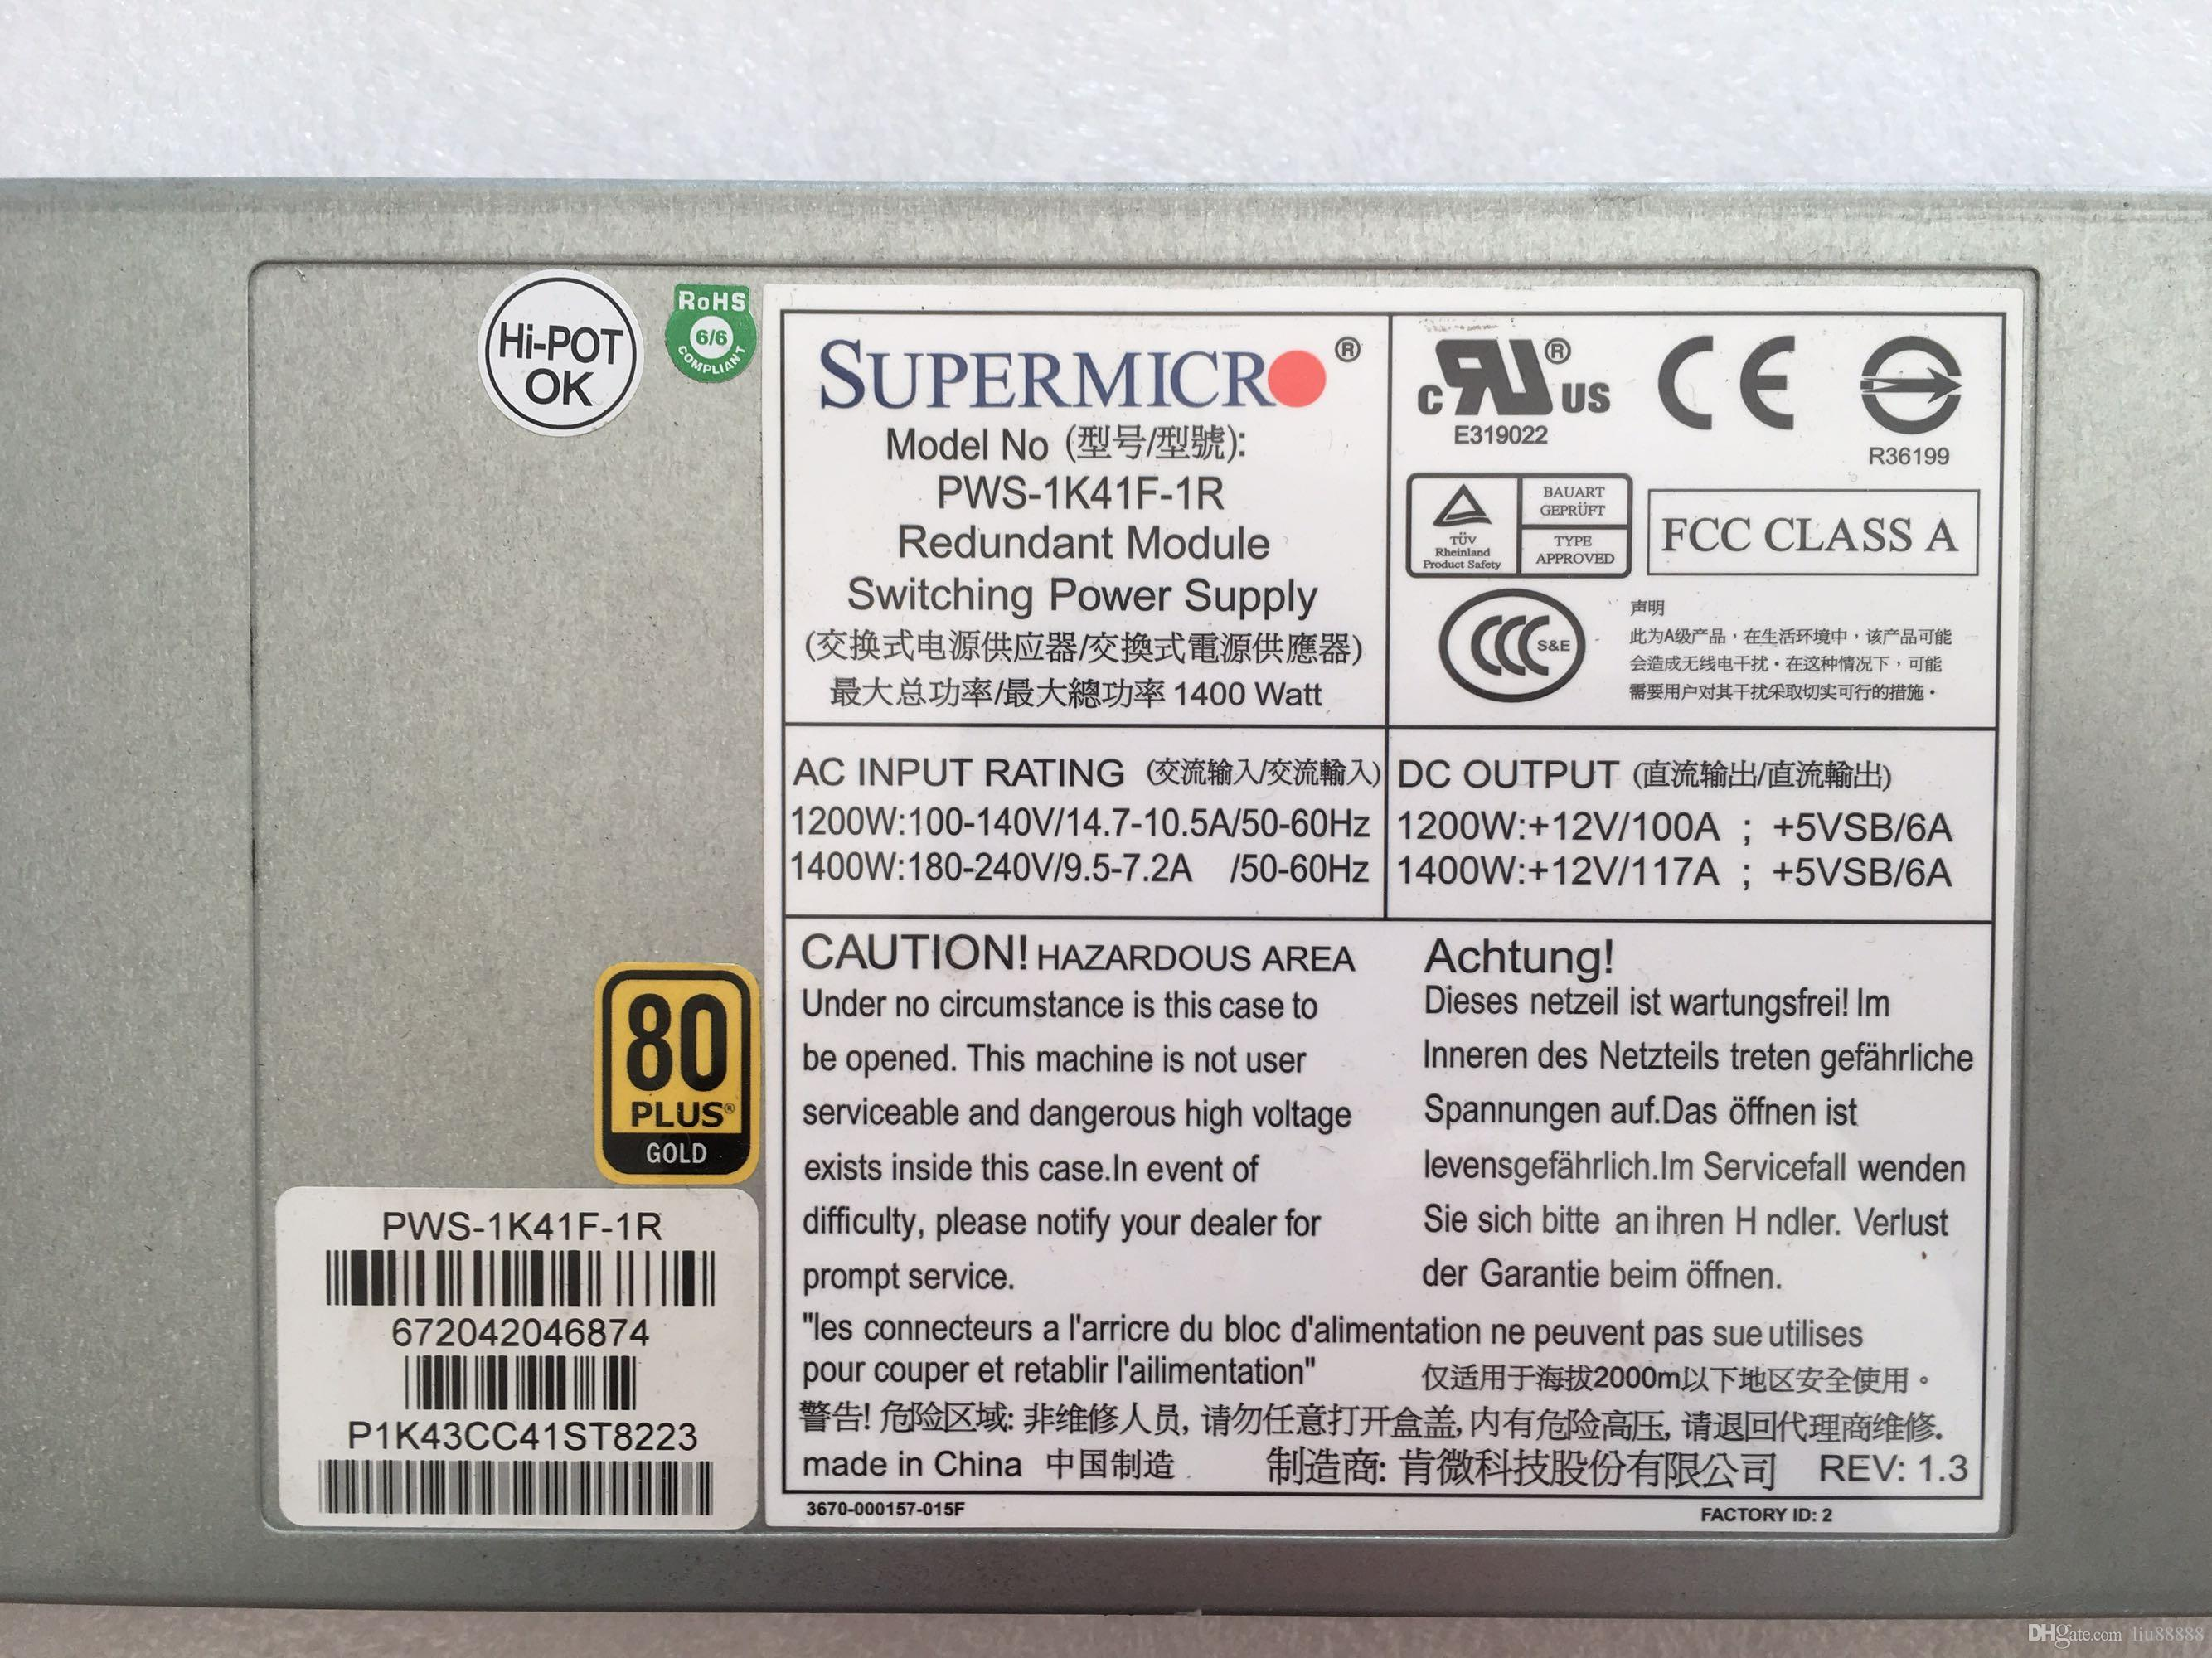 Original power supply For RH2488 V2 PWS-1K41F-1R 1400W